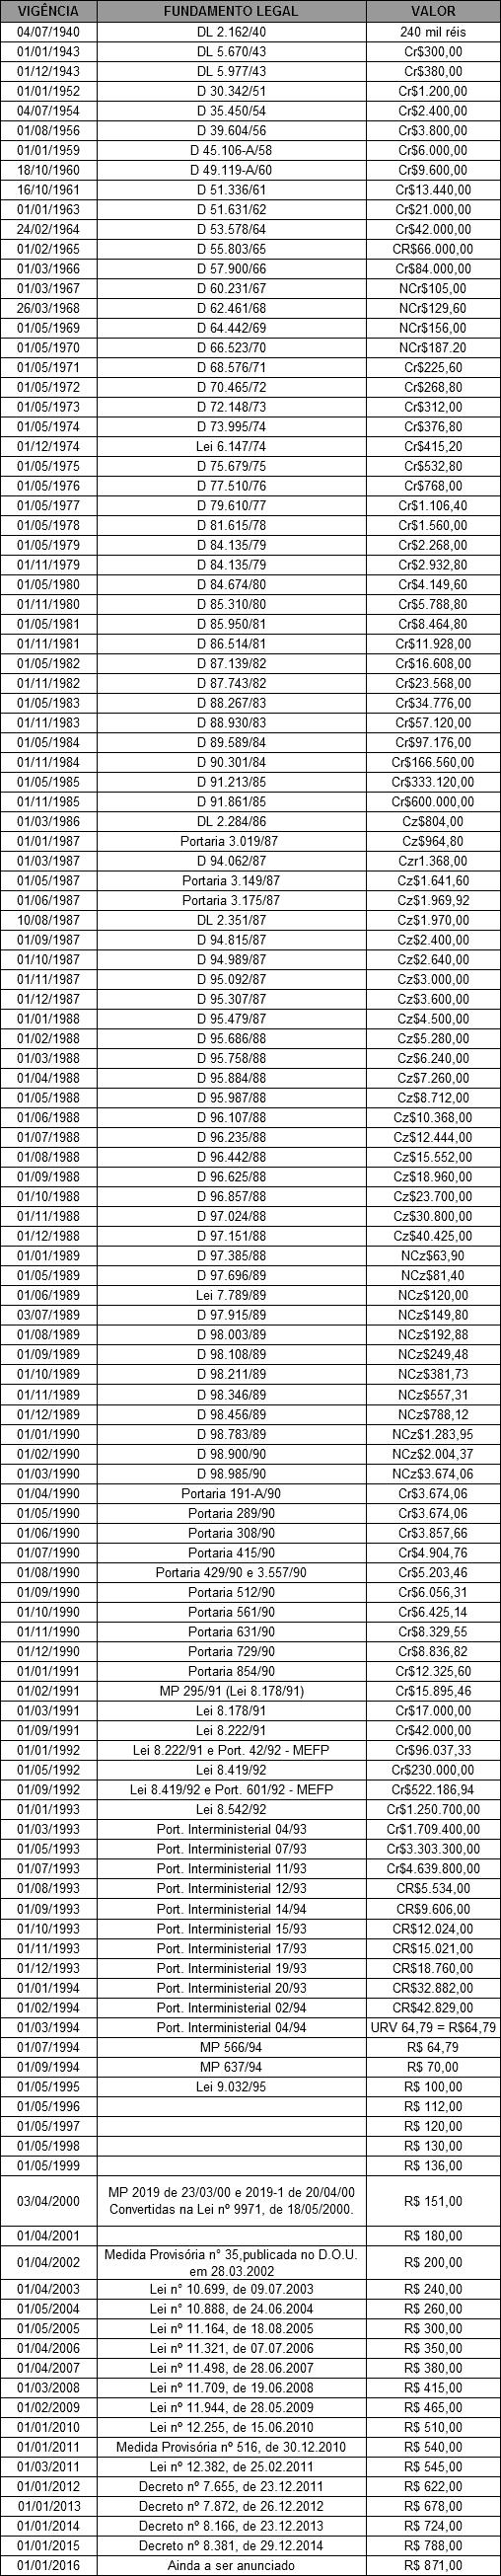 Tabela Histórica do Salário Mínimo